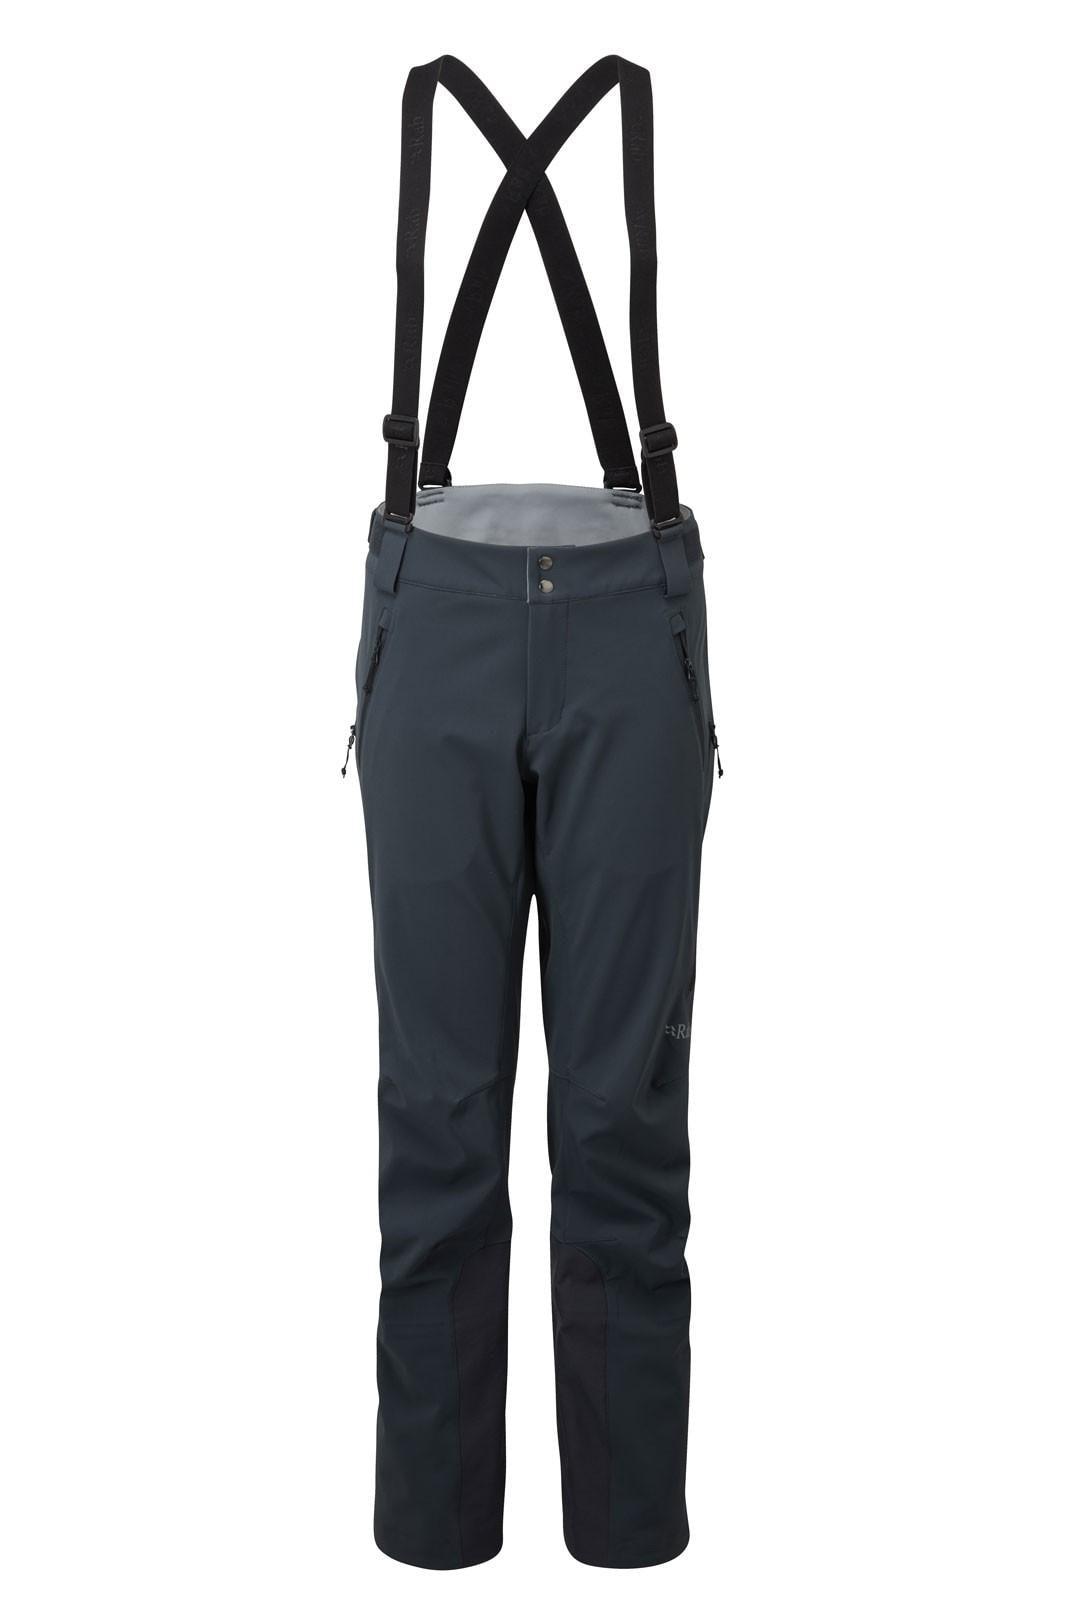 Rab Ascendor Pants W's